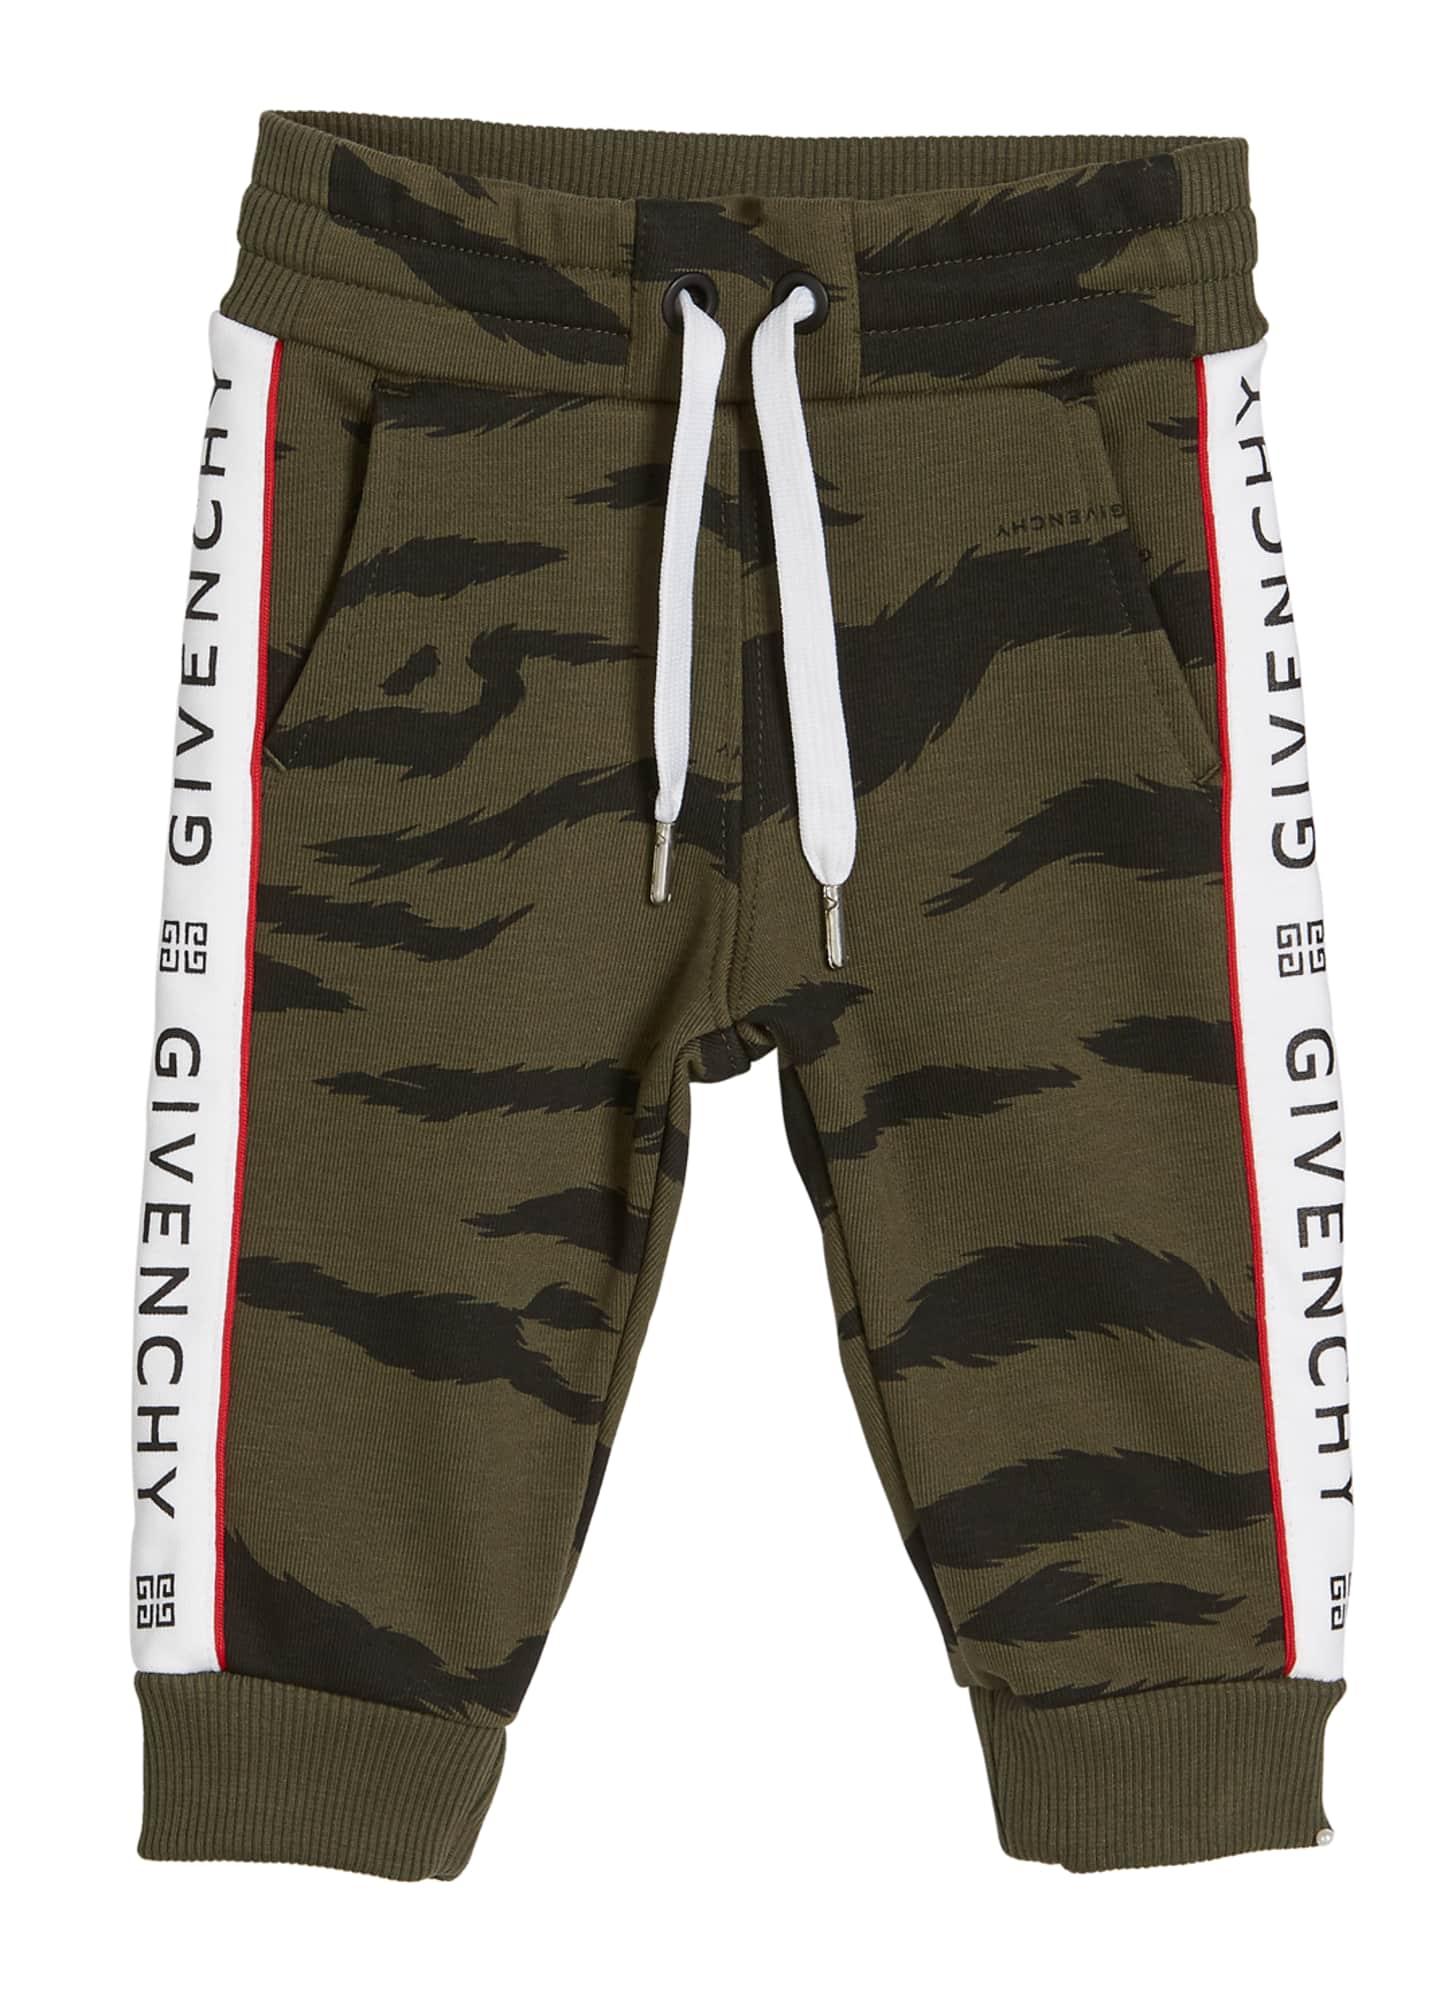 Givenchy Boy's Camo Sweatpants w/ Logo Taping, Size